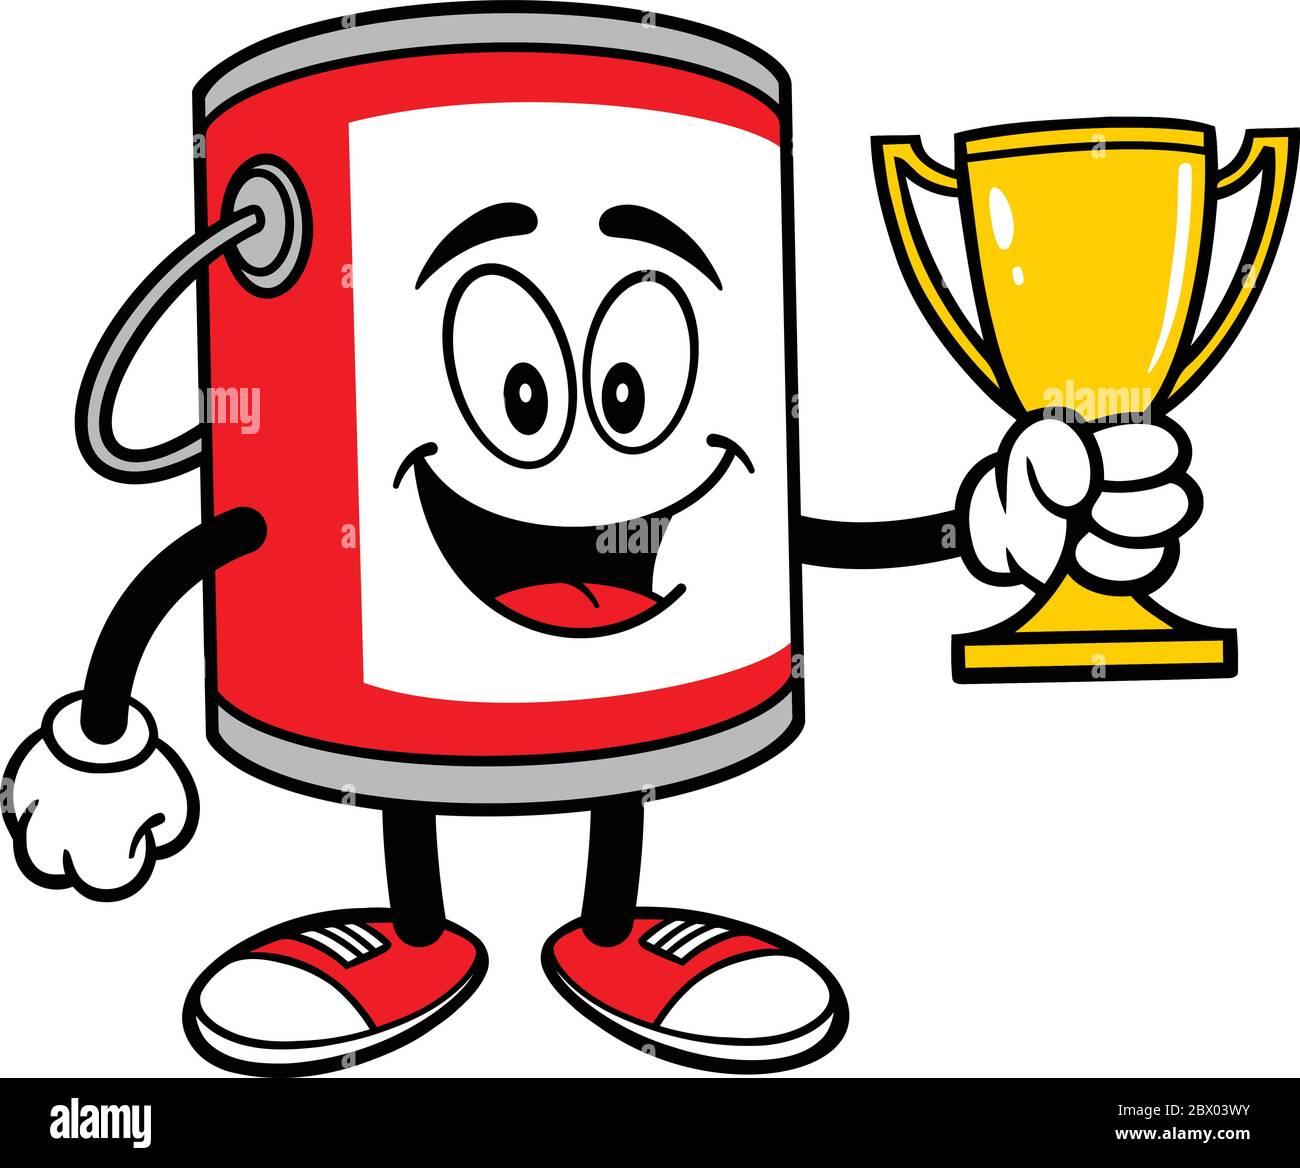 Paint Bucket Mascot With Trophy A Cartoon Illustration Of A Paint Bucket Mascot With A Trophy Stock Vector Image Art Alamy